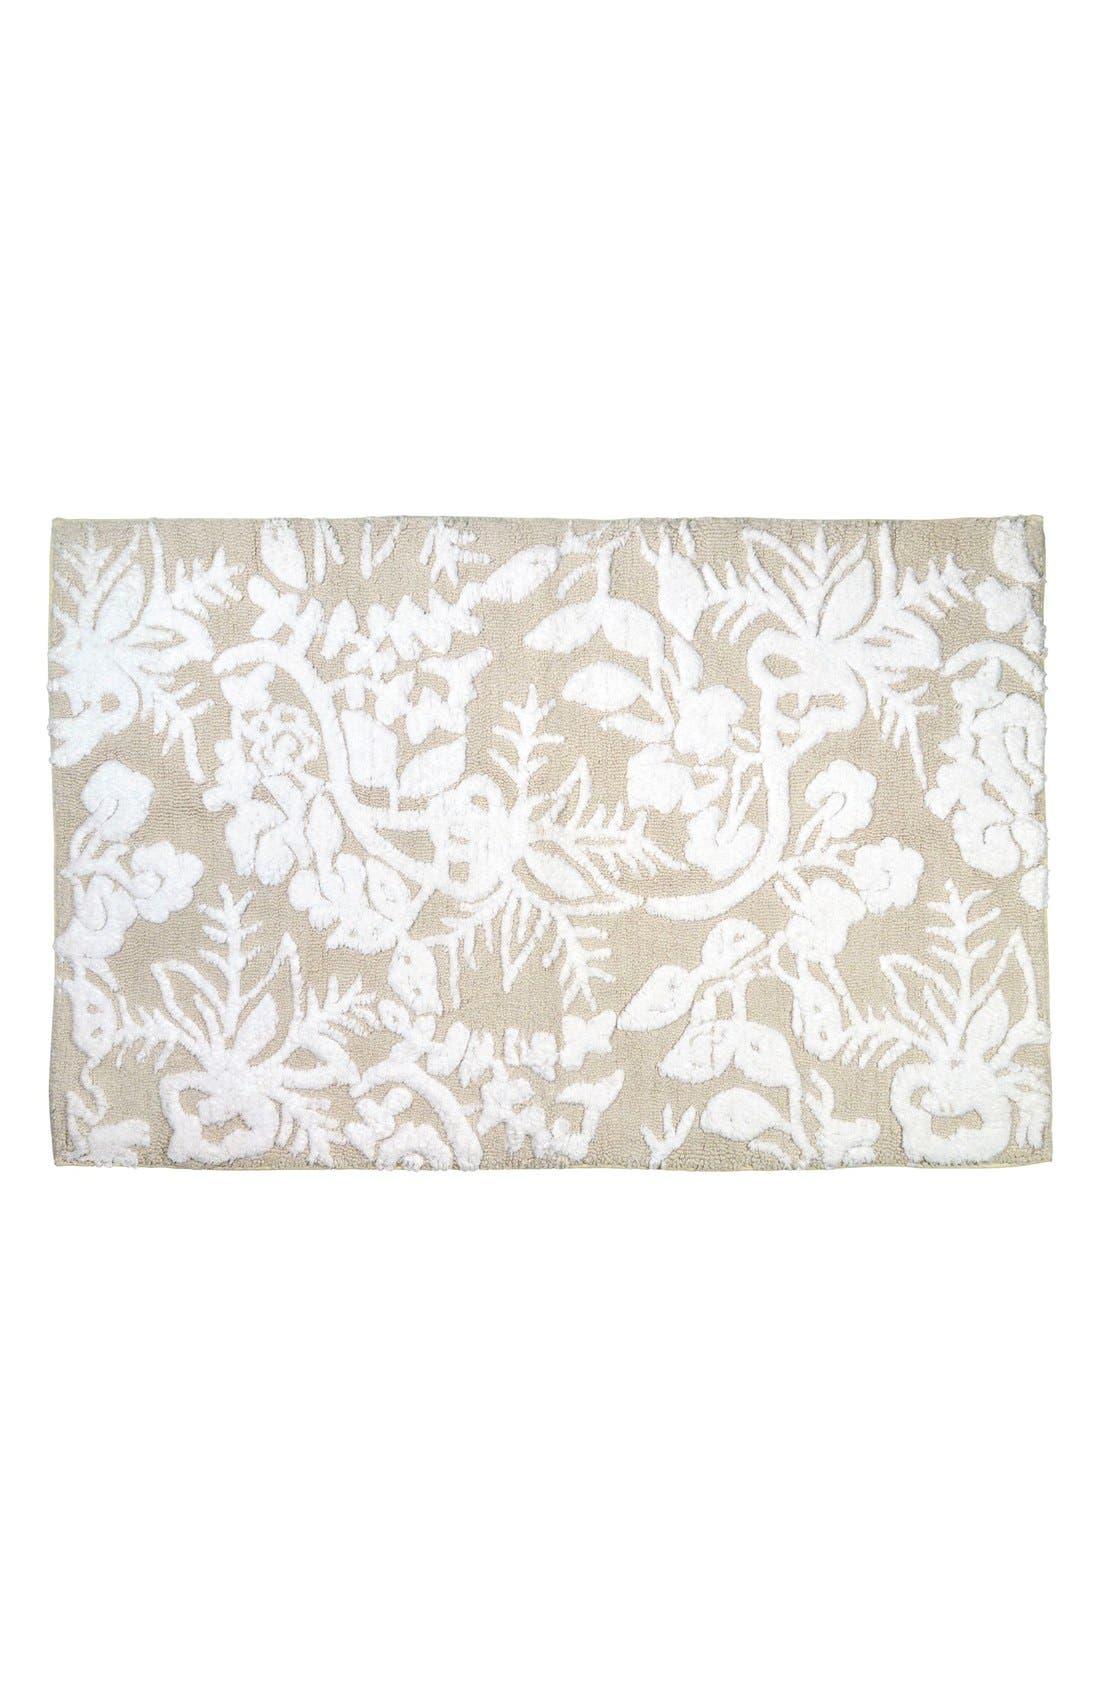 'Pasak' Bath Rug,                         Main,                         color, Linen